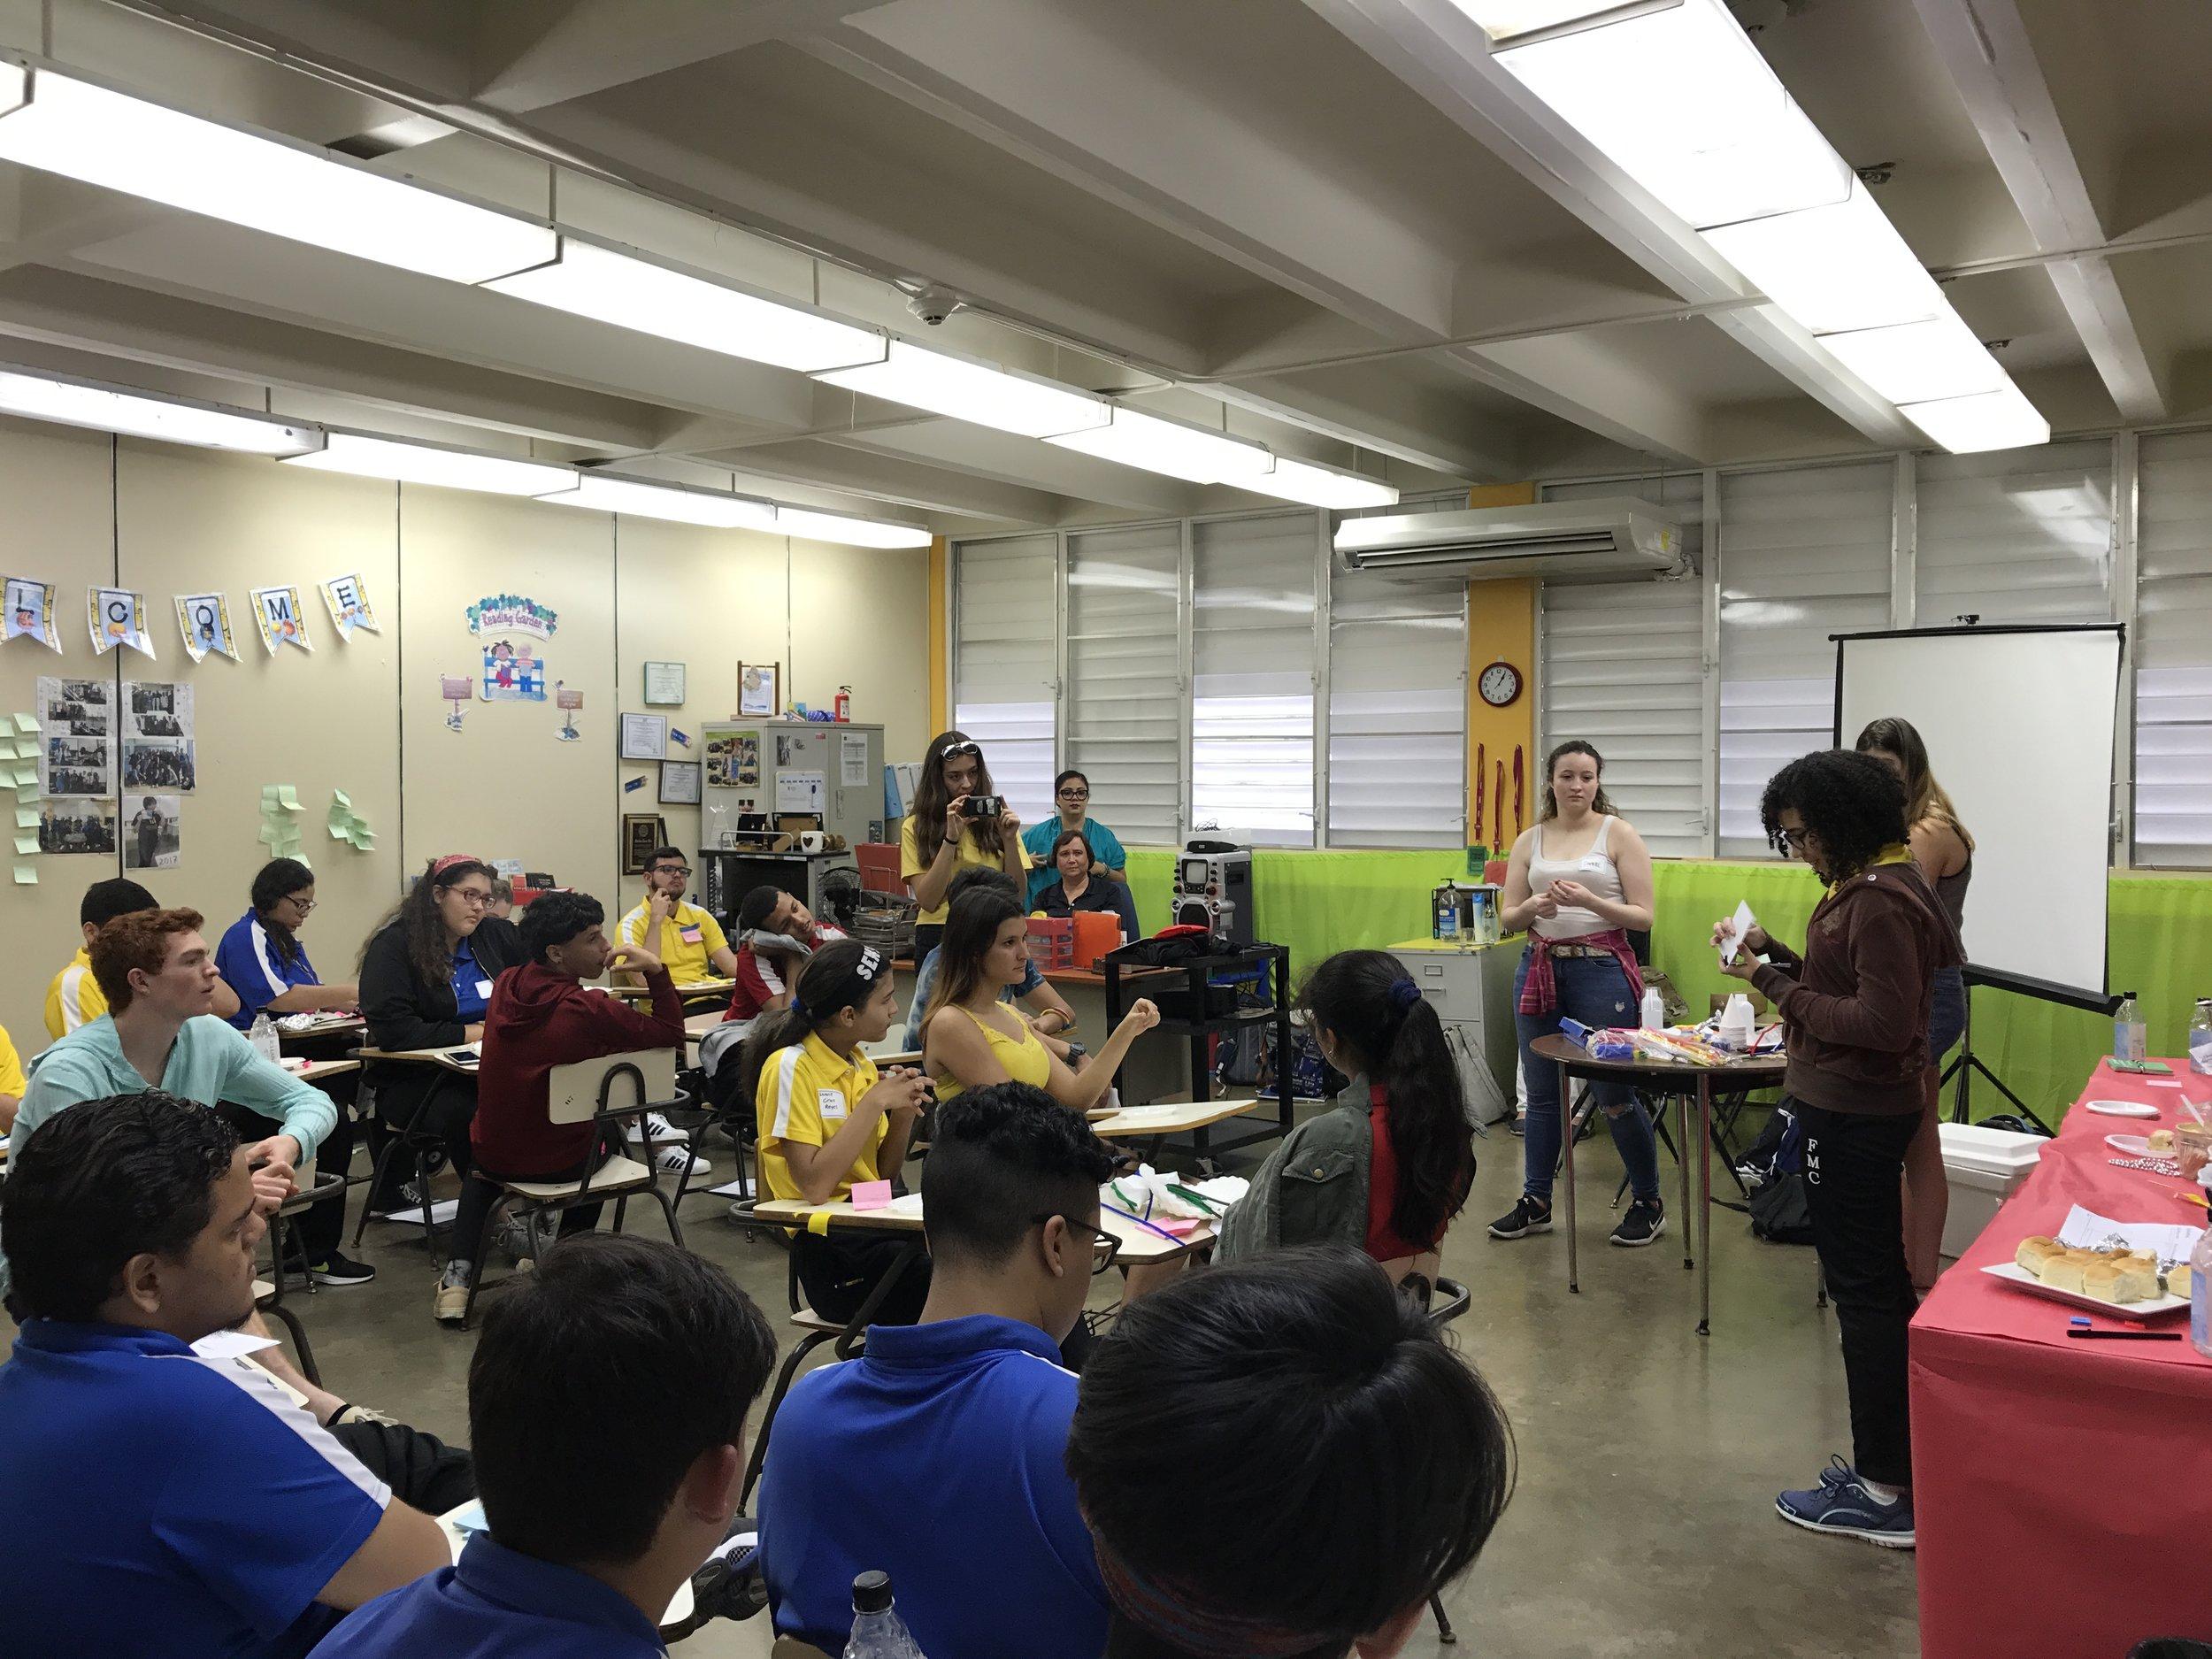 Students working together at Escuala Francisco Manrique Cabrera